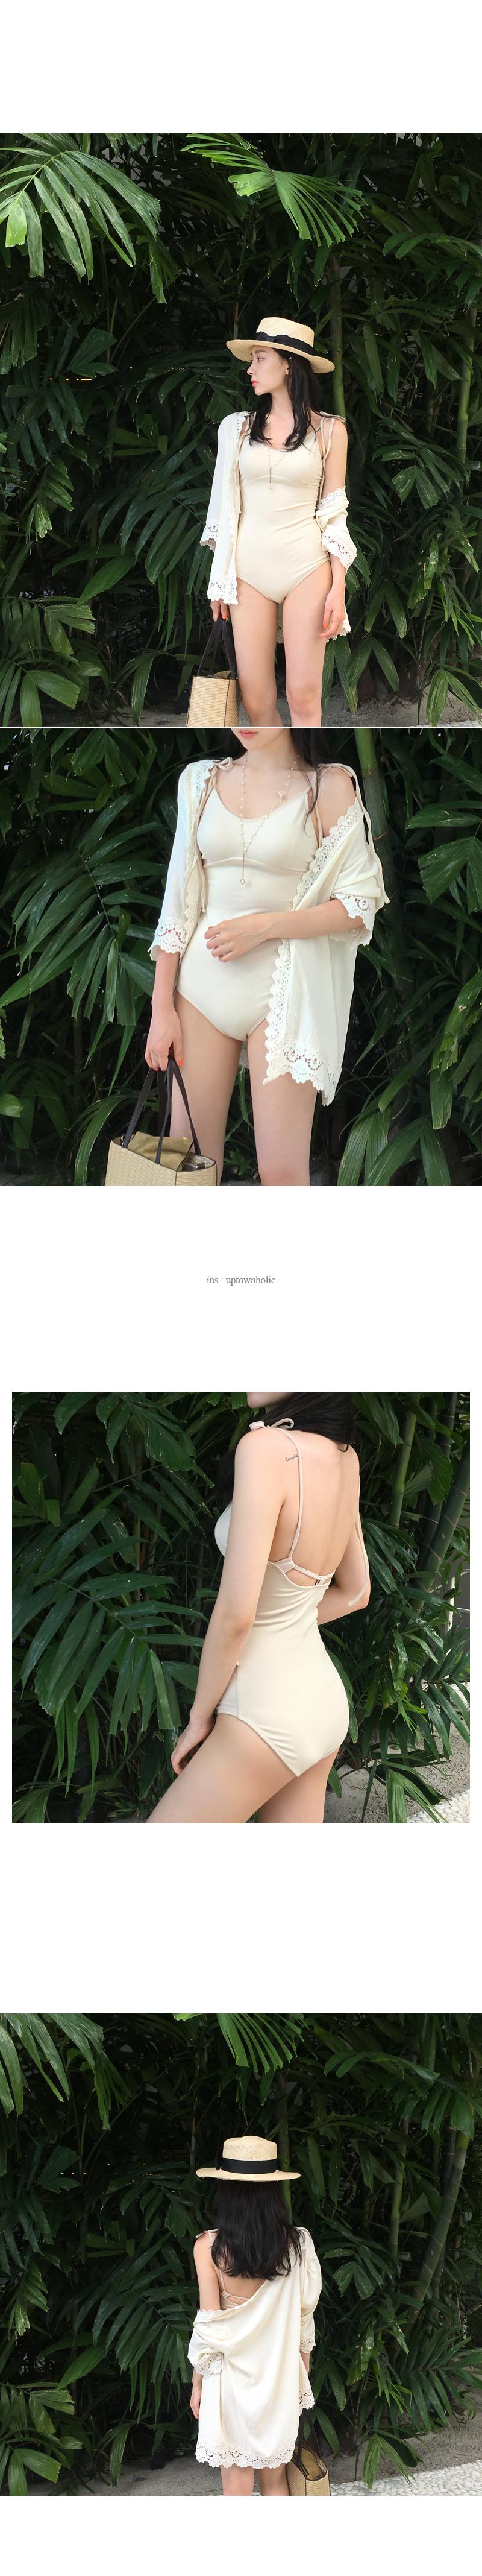 Offer sand bikini